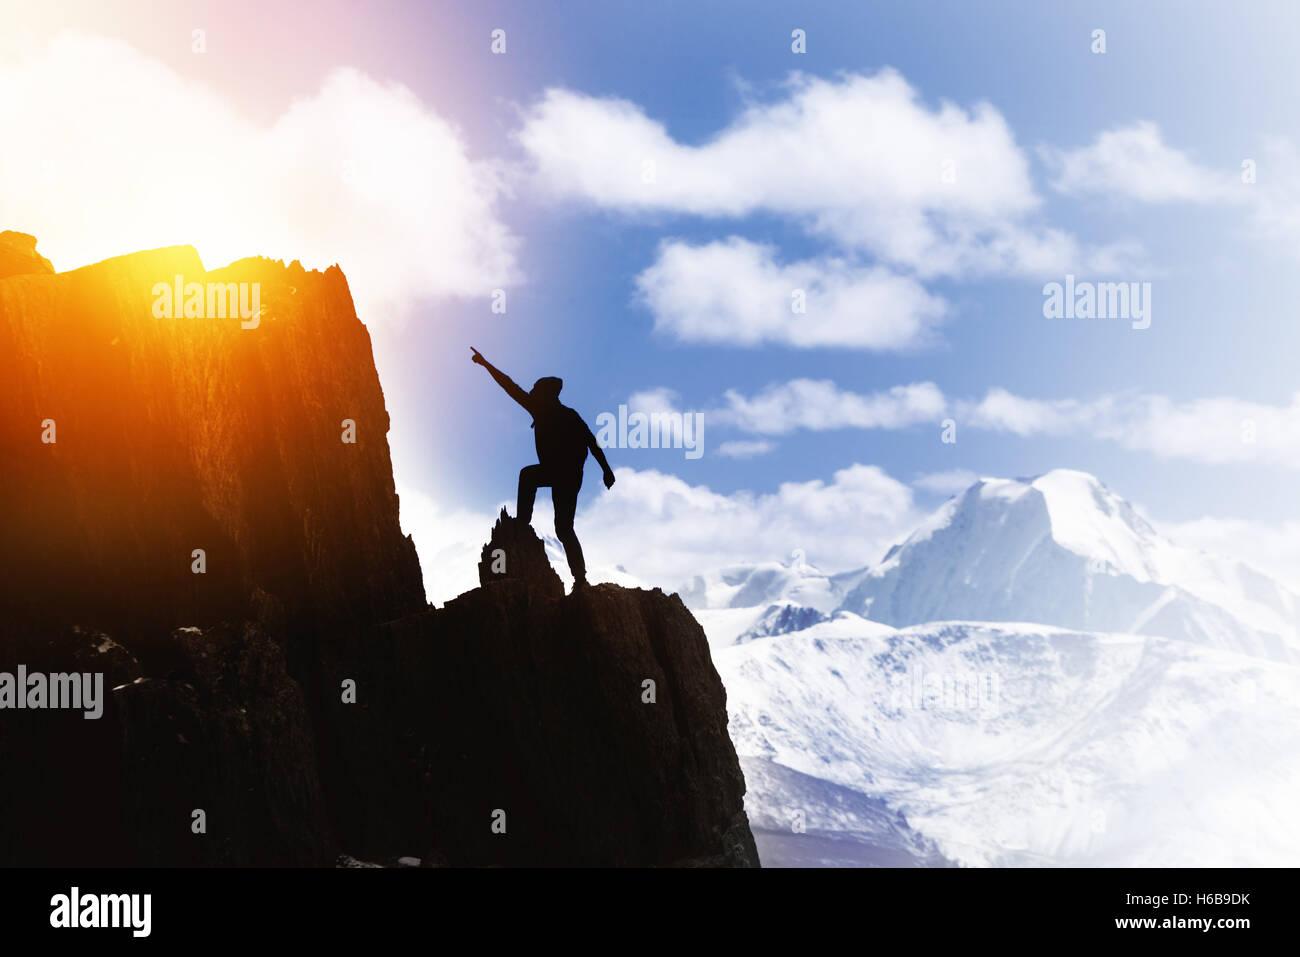 ambition and aspiration